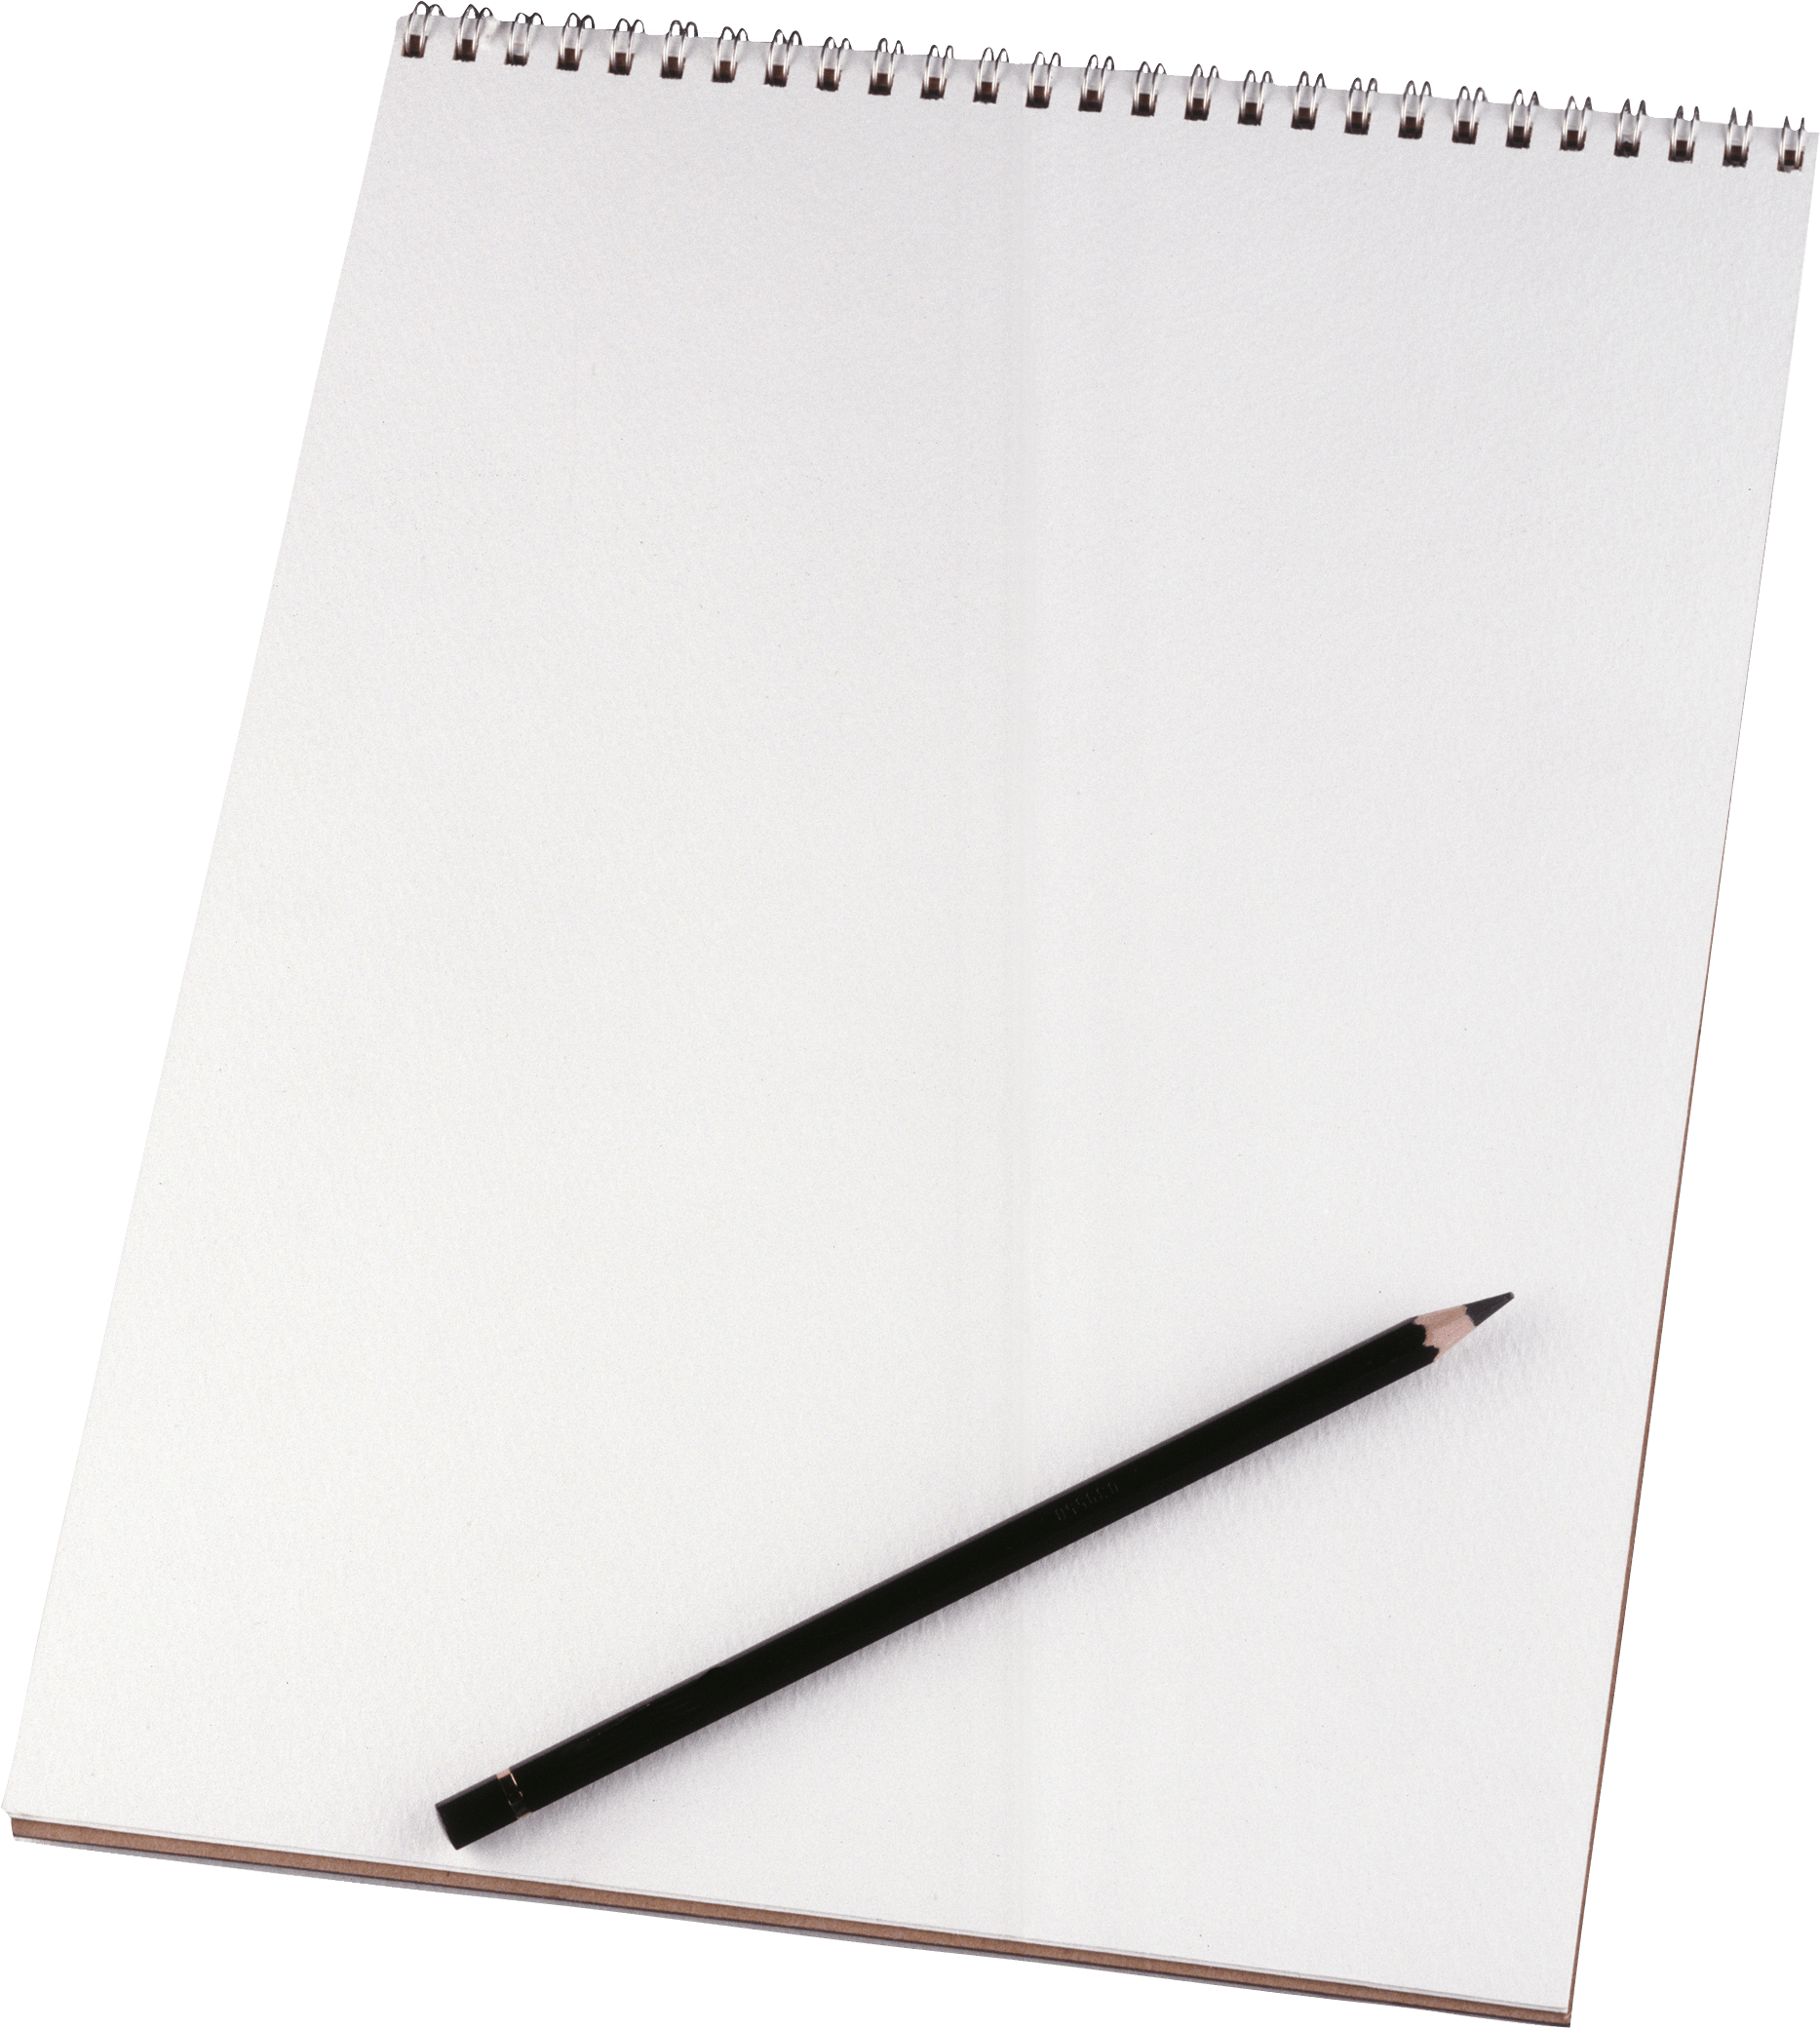 Paper Sheet PNG - 13462